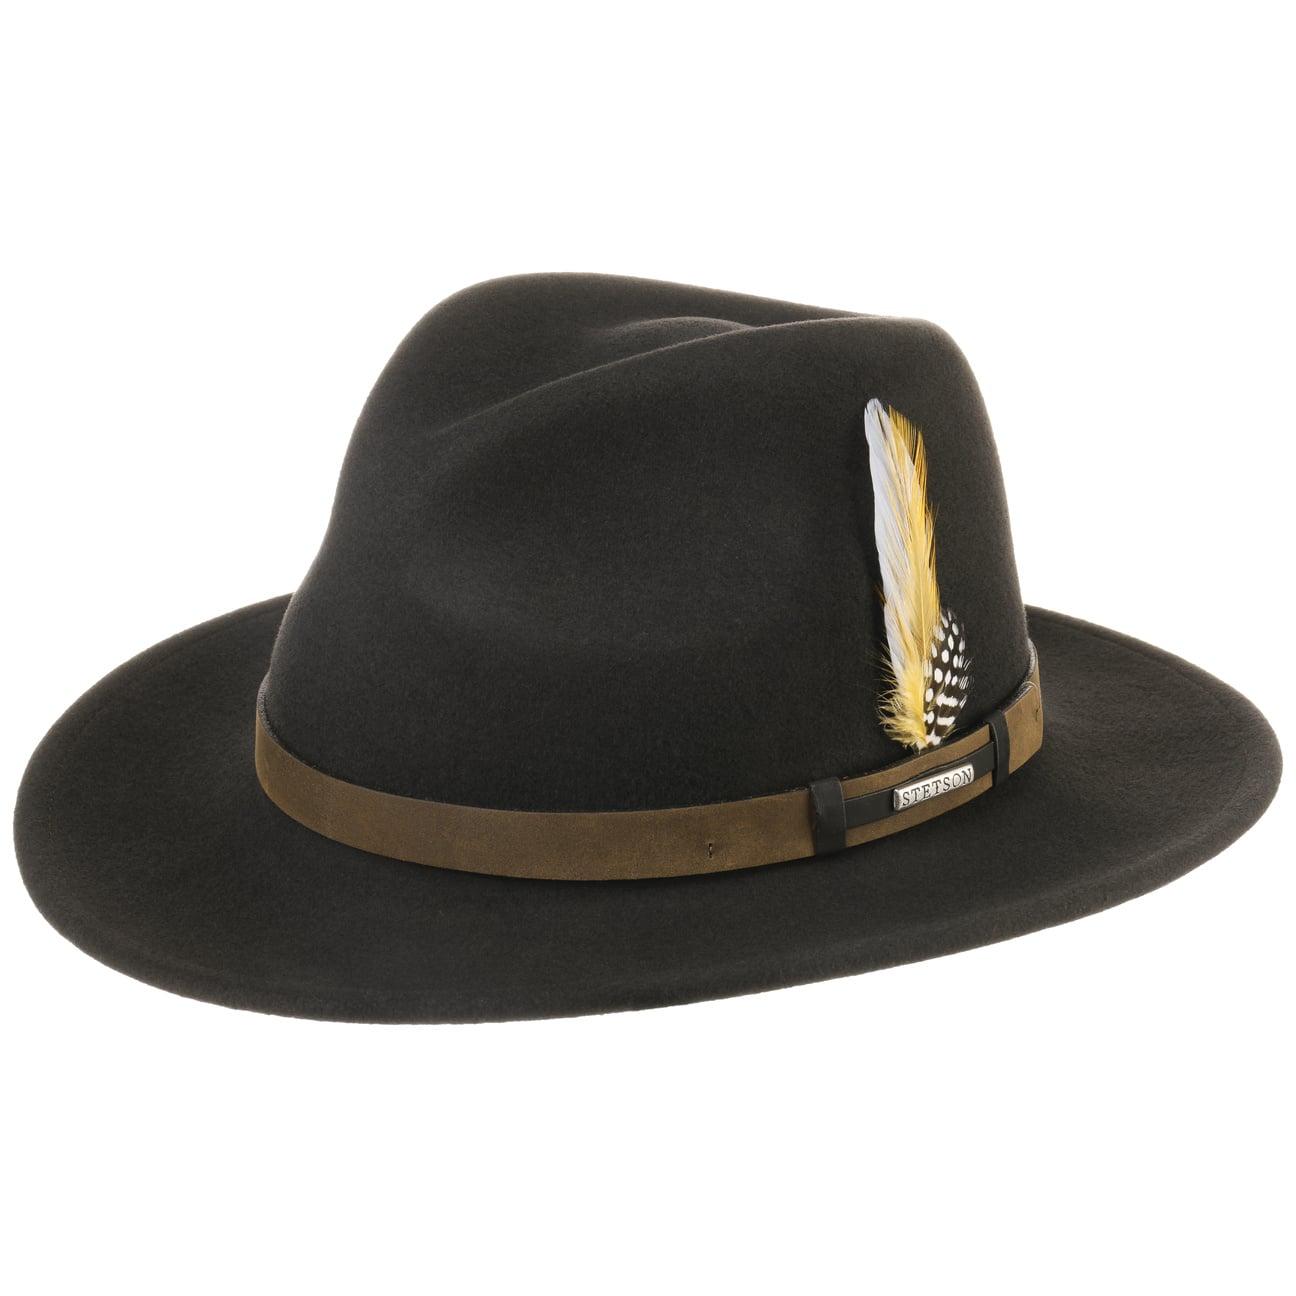 ... Sardis VitaFelt Traveller Hat by Stetson - brown 1 ... 54cd7a143b8